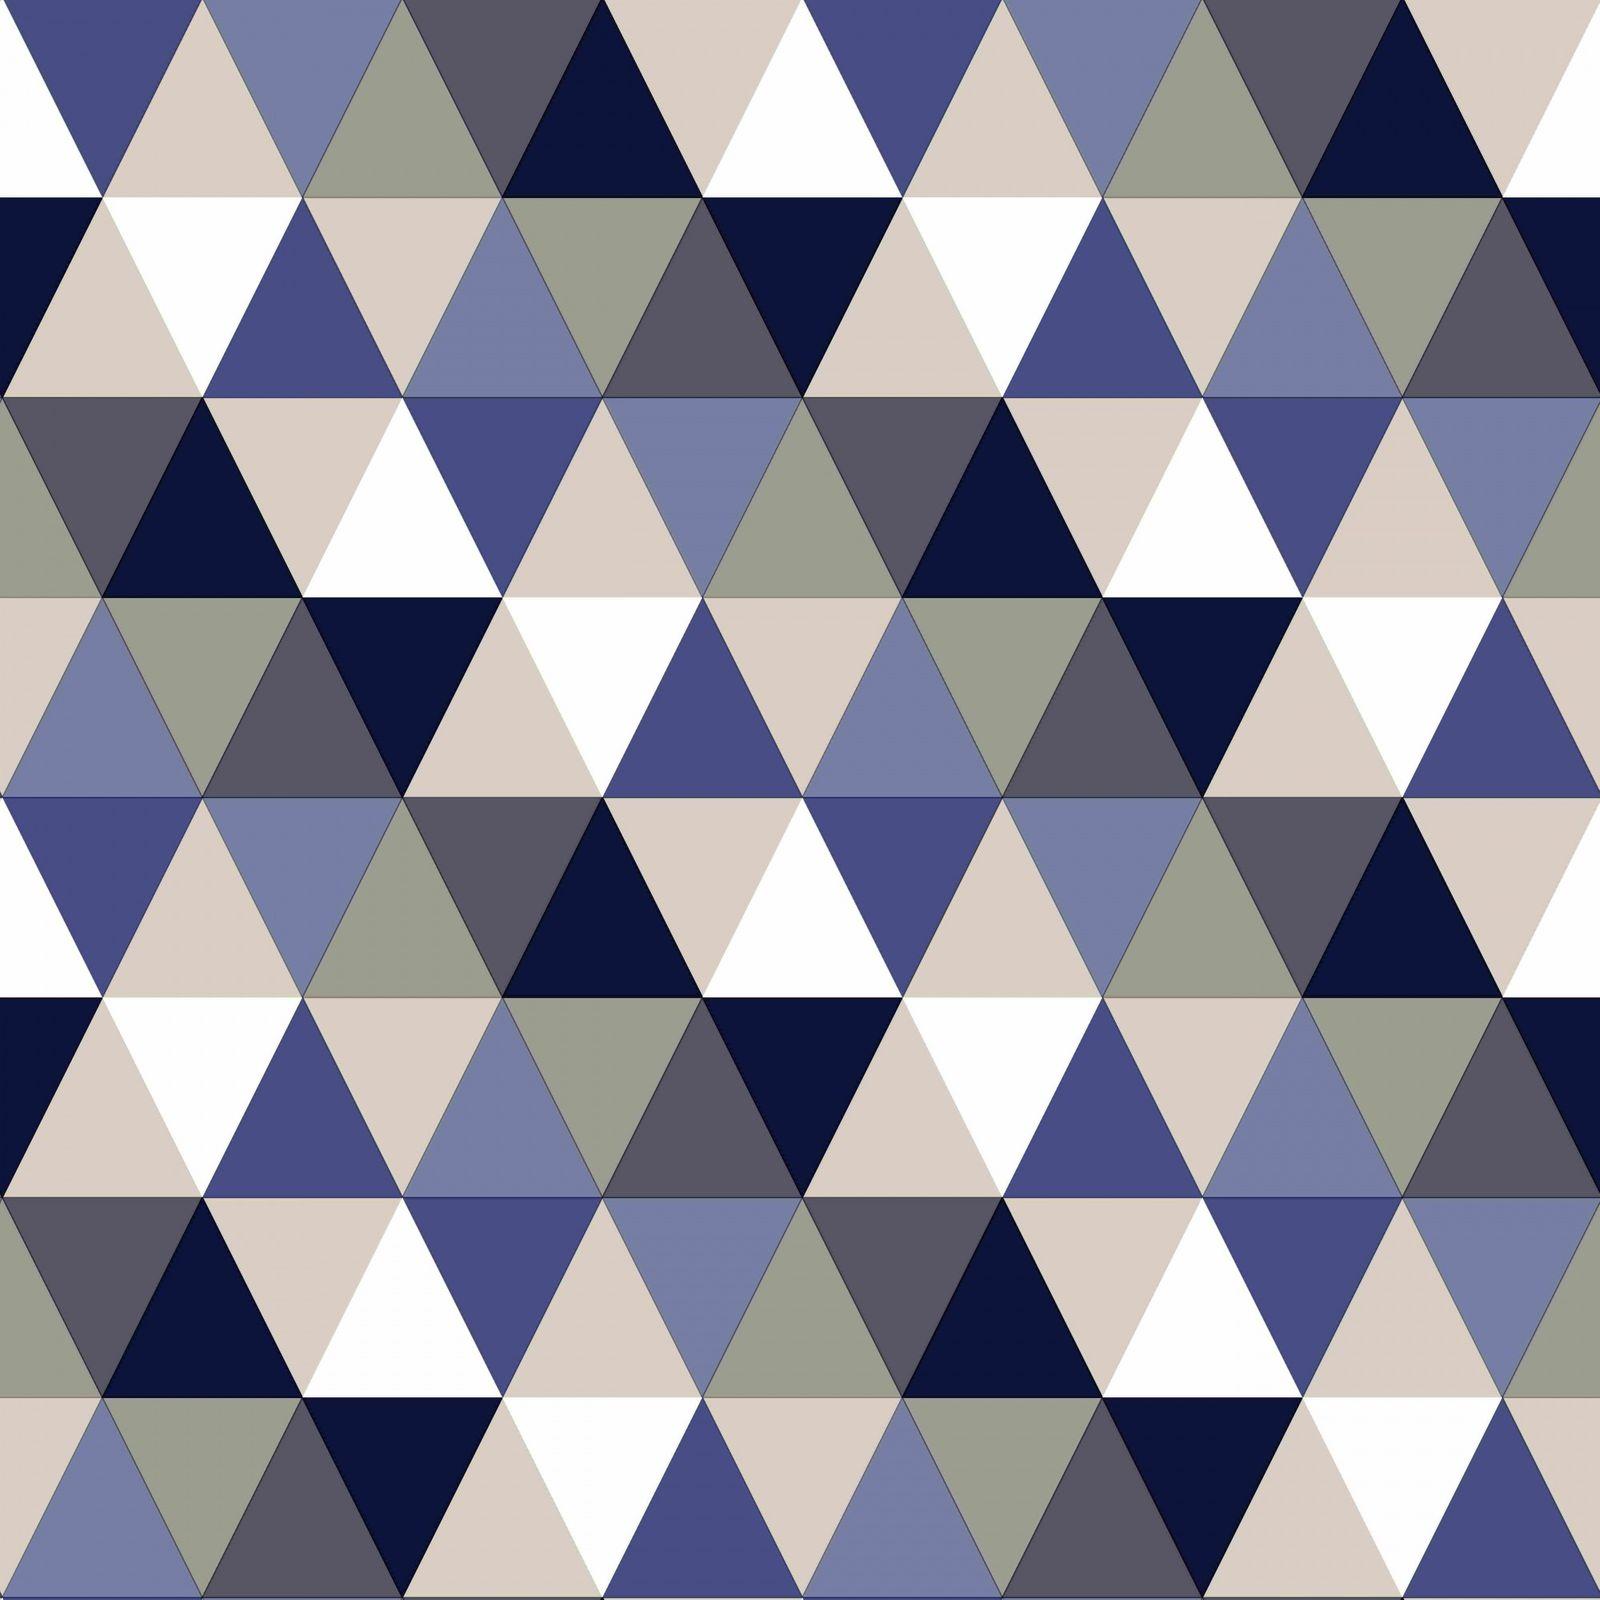 tapete vlies dreiecke blau wei beige everybody bonjour 138716. Black Bedroom Furniture Sets. Home Design Ideas